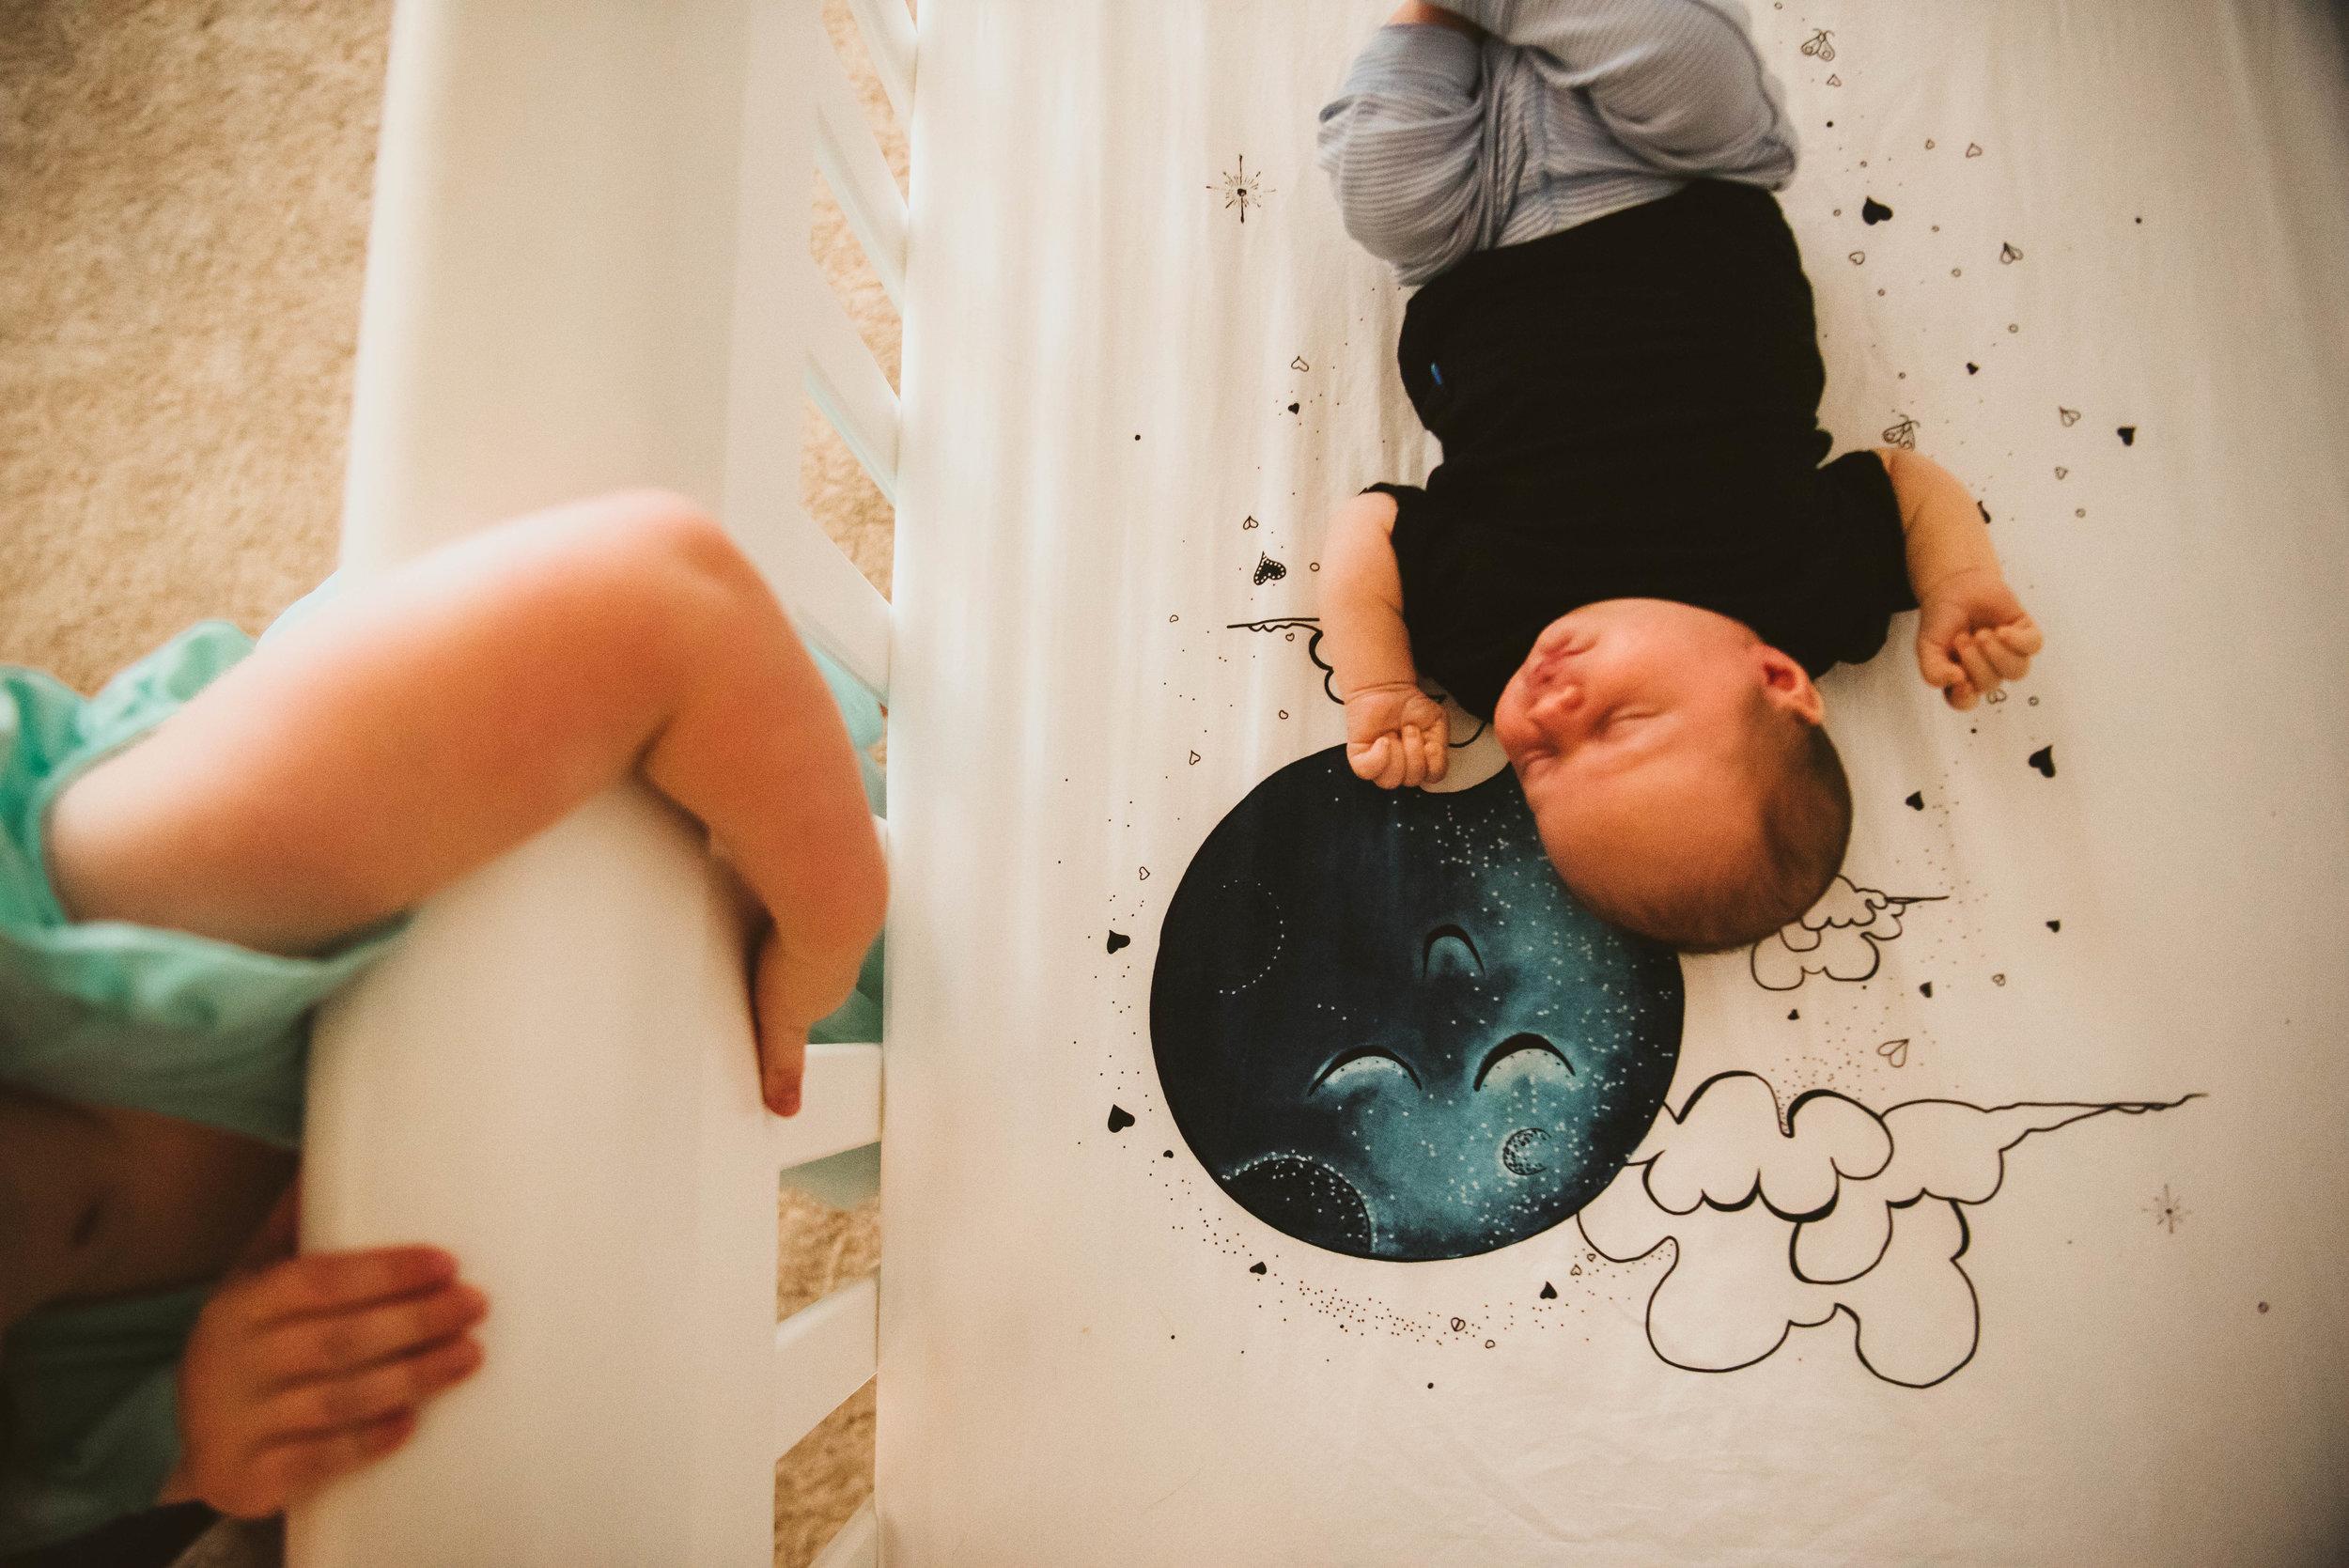 Lets_Spread_Beauty_Photography_Hamill Newborn20150728_0606.jpg